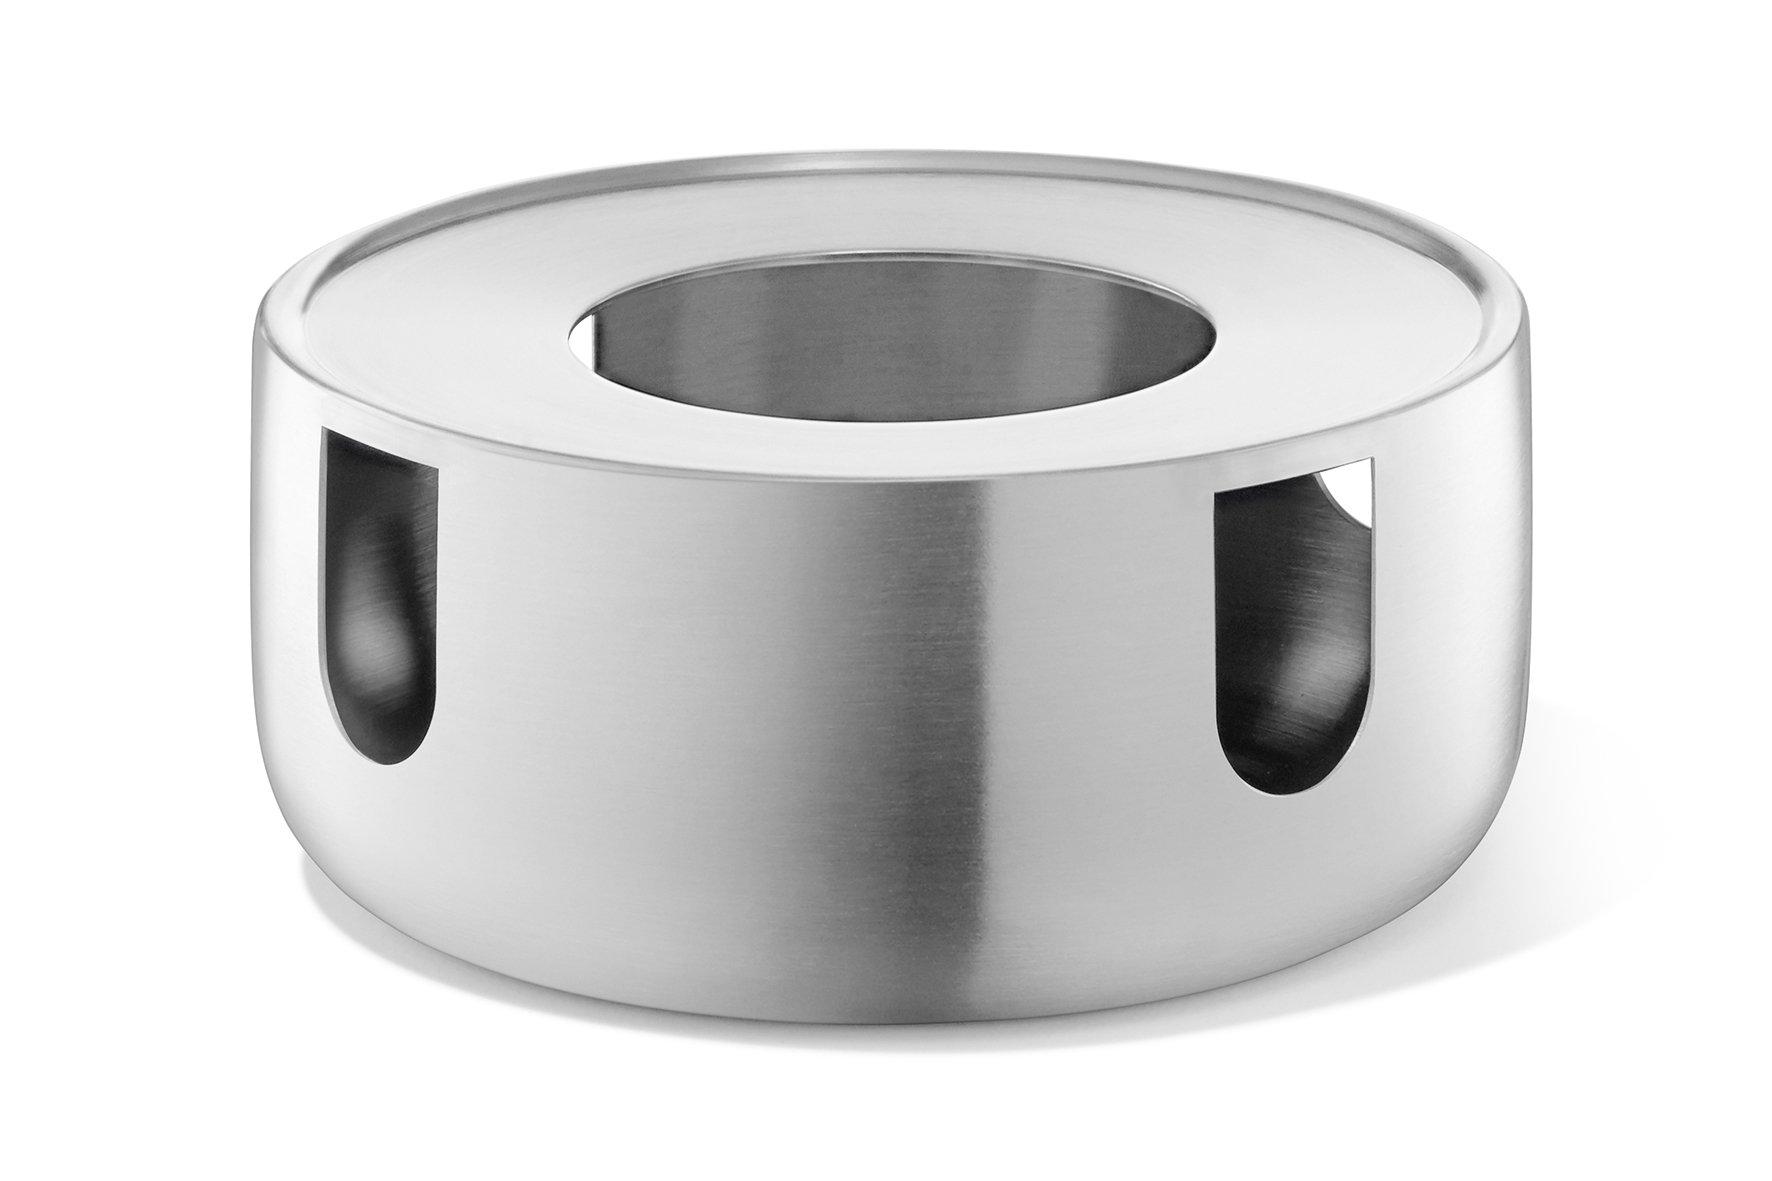 ZACK 20871 ORIGINAL''BEVO'' Tea Warmer, Stainless Steel